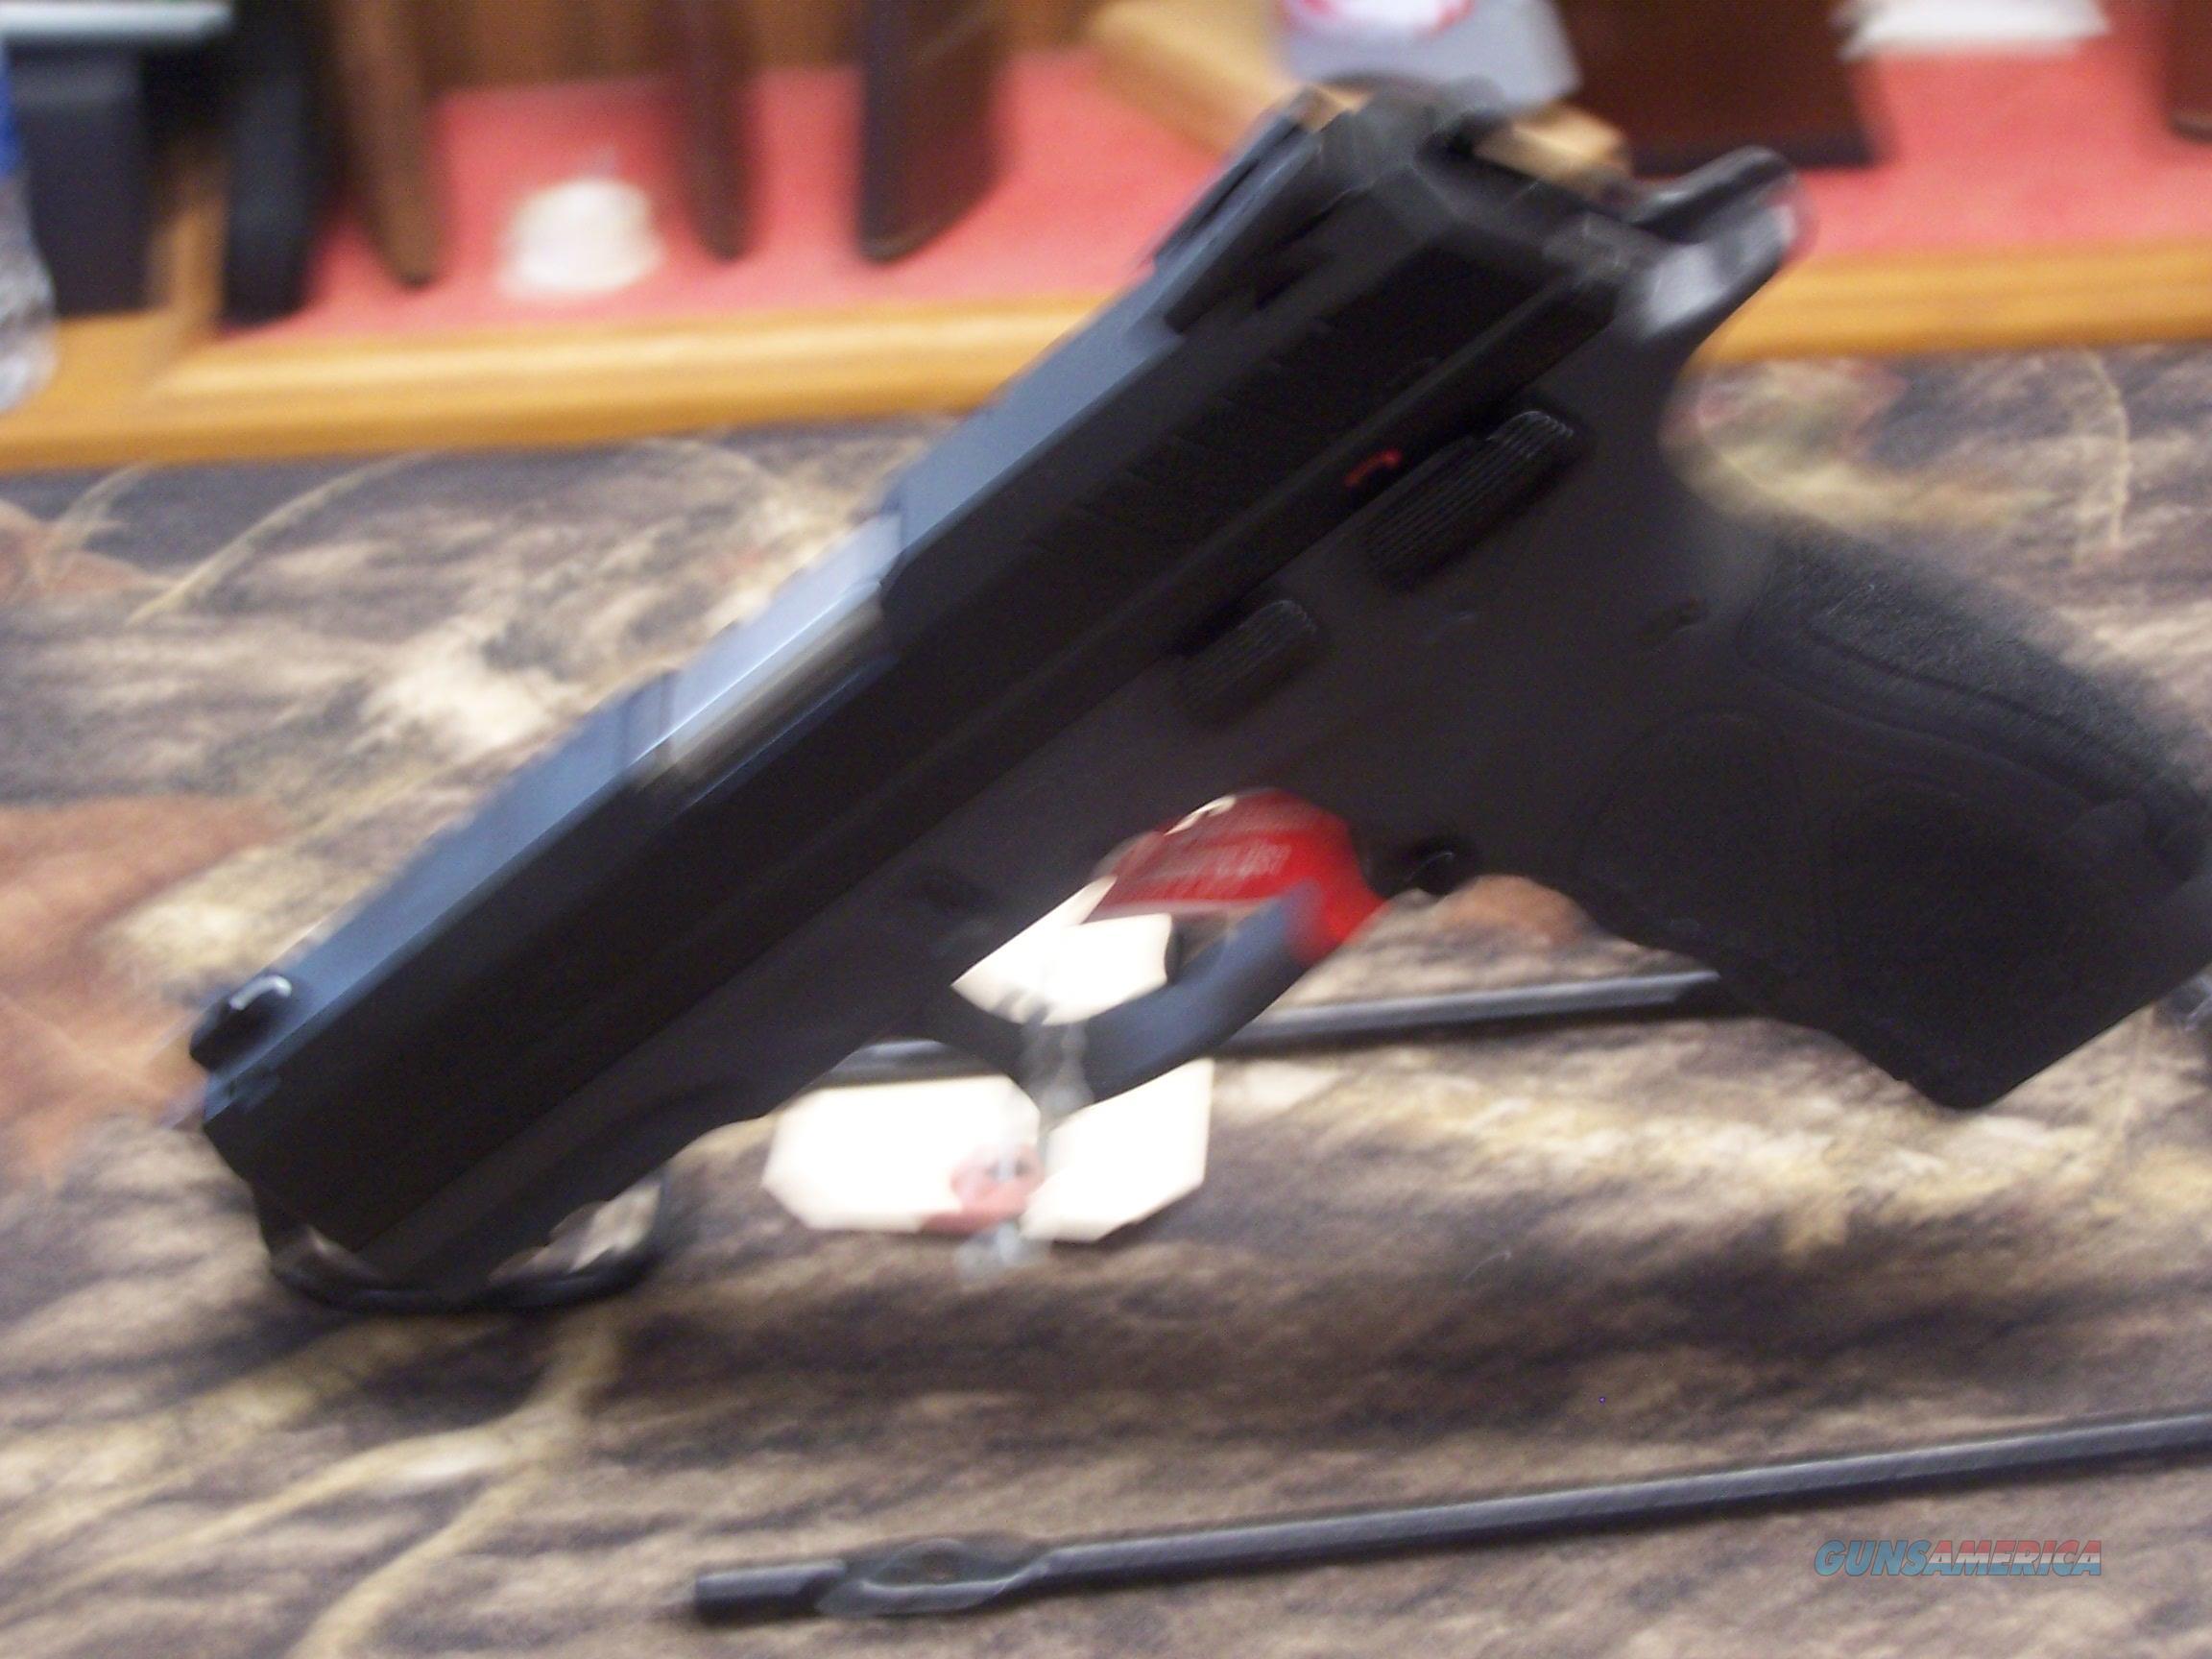 "Taurus TH9 9mm 4.27"" Hammer Fired Pistol, Black. NIB !!!  Guns > Pistols > Taurus Pistols > Semi Auto Pistols > Polymer Frame"